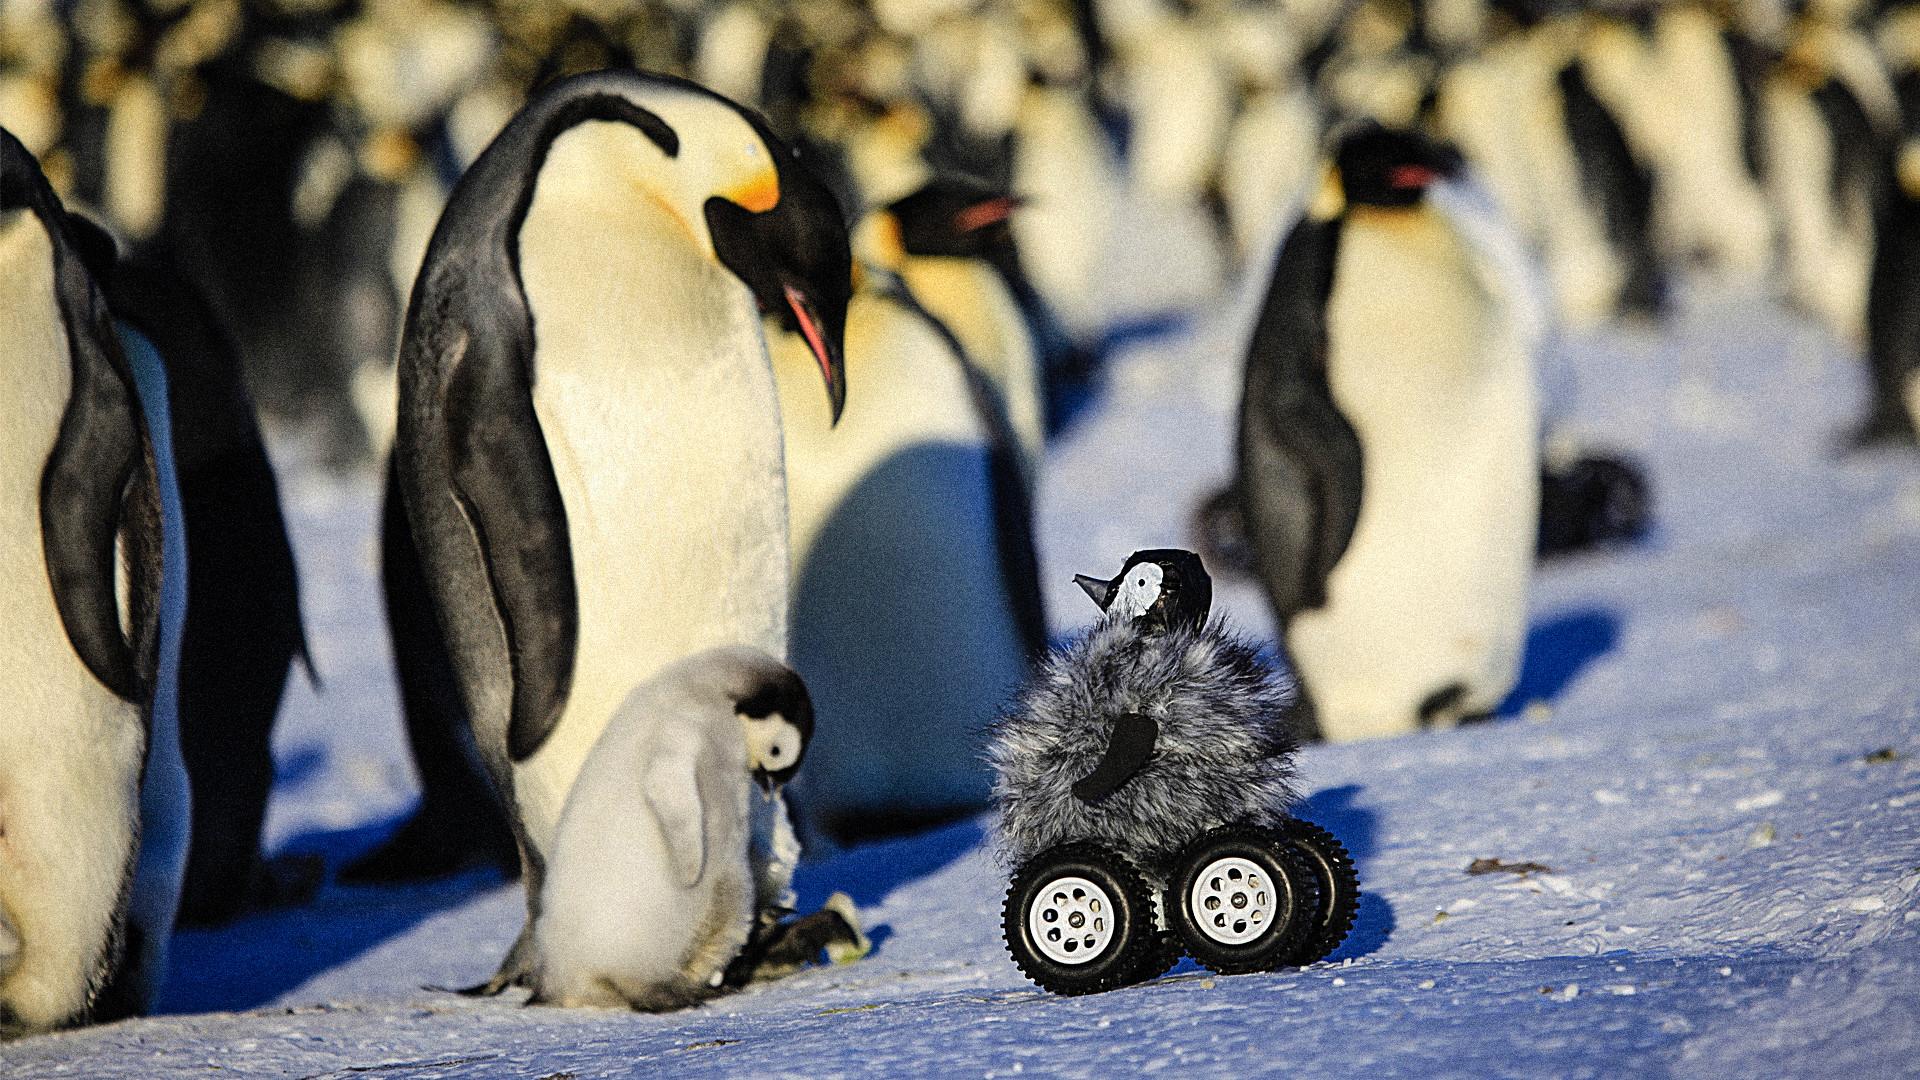 … Baby Penguin Robot_Plaid Zebra